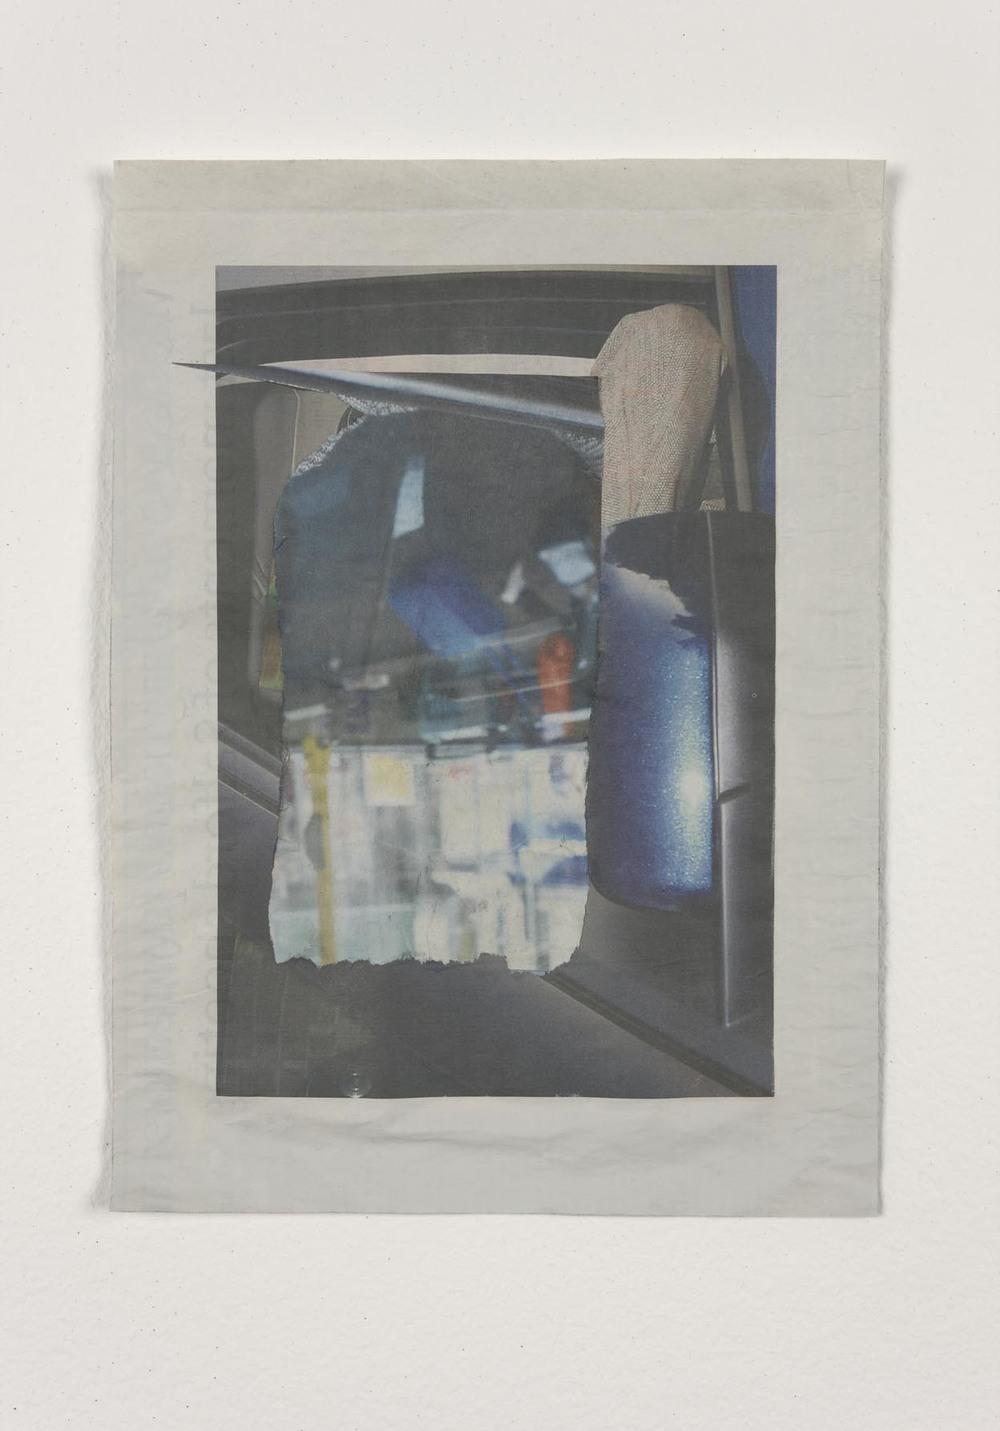 Untitled   2012   Acrylic on newsprint   28.5 x 21 cm / 11.2 x 8.2 in